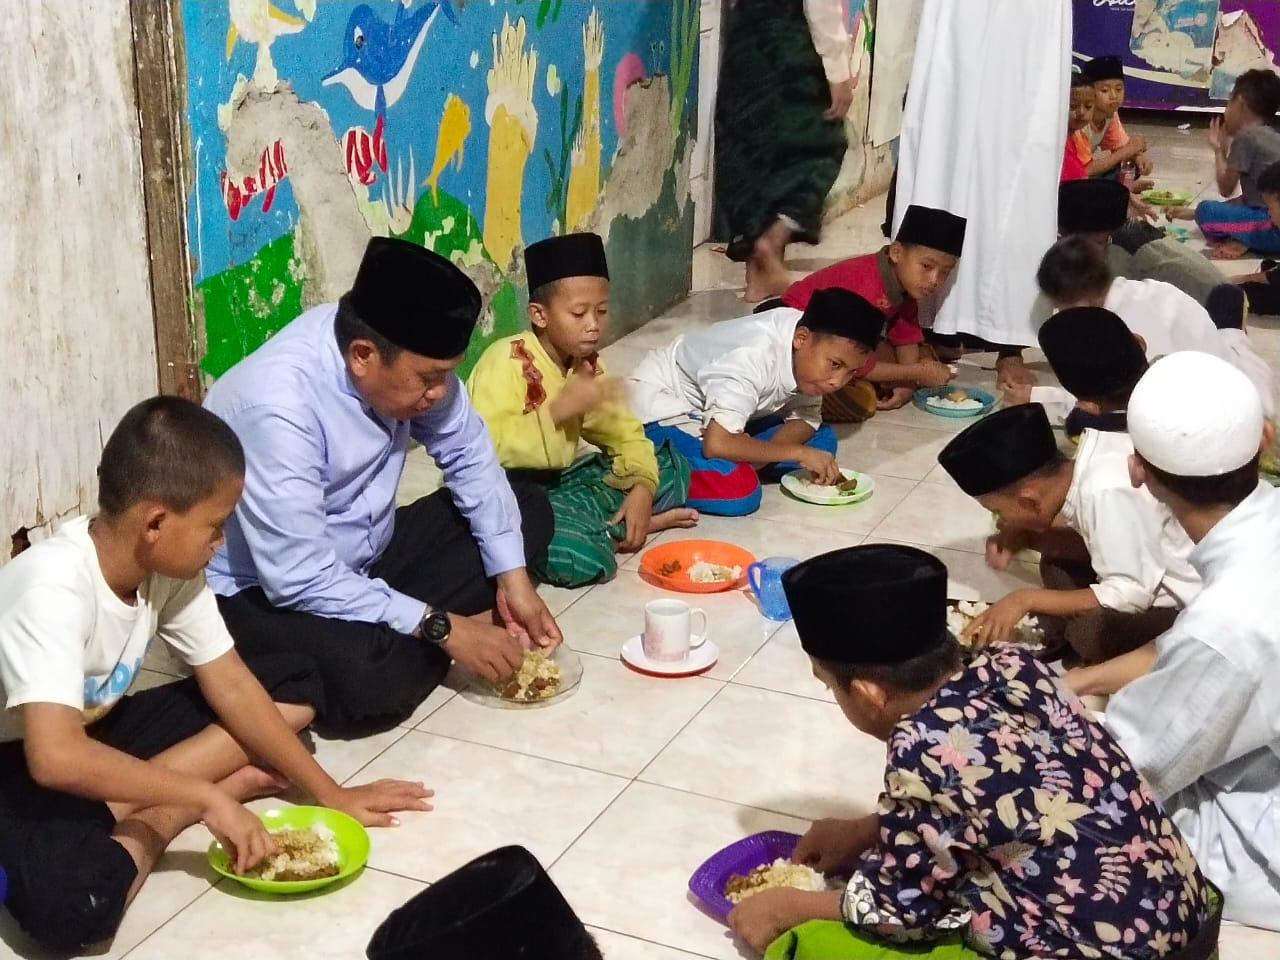 Dirbinmas Polda Banten Rayakan Maulid Nabi Muhammad SAW di Ponpes Baitul Qur'an